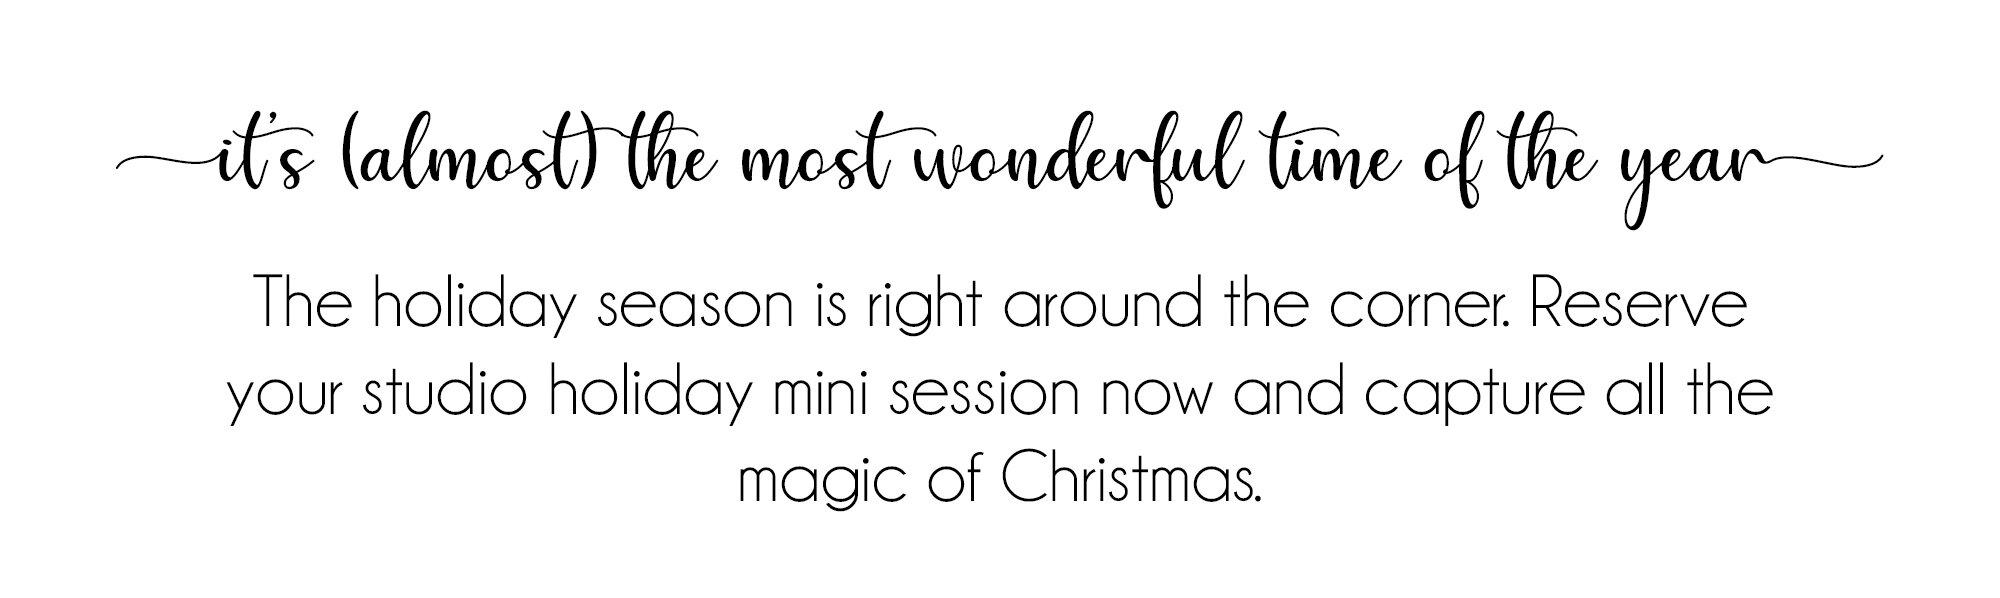 raleigh-holiday-mini-session-christmas-card-photos-wake-forest-photographer.jpg